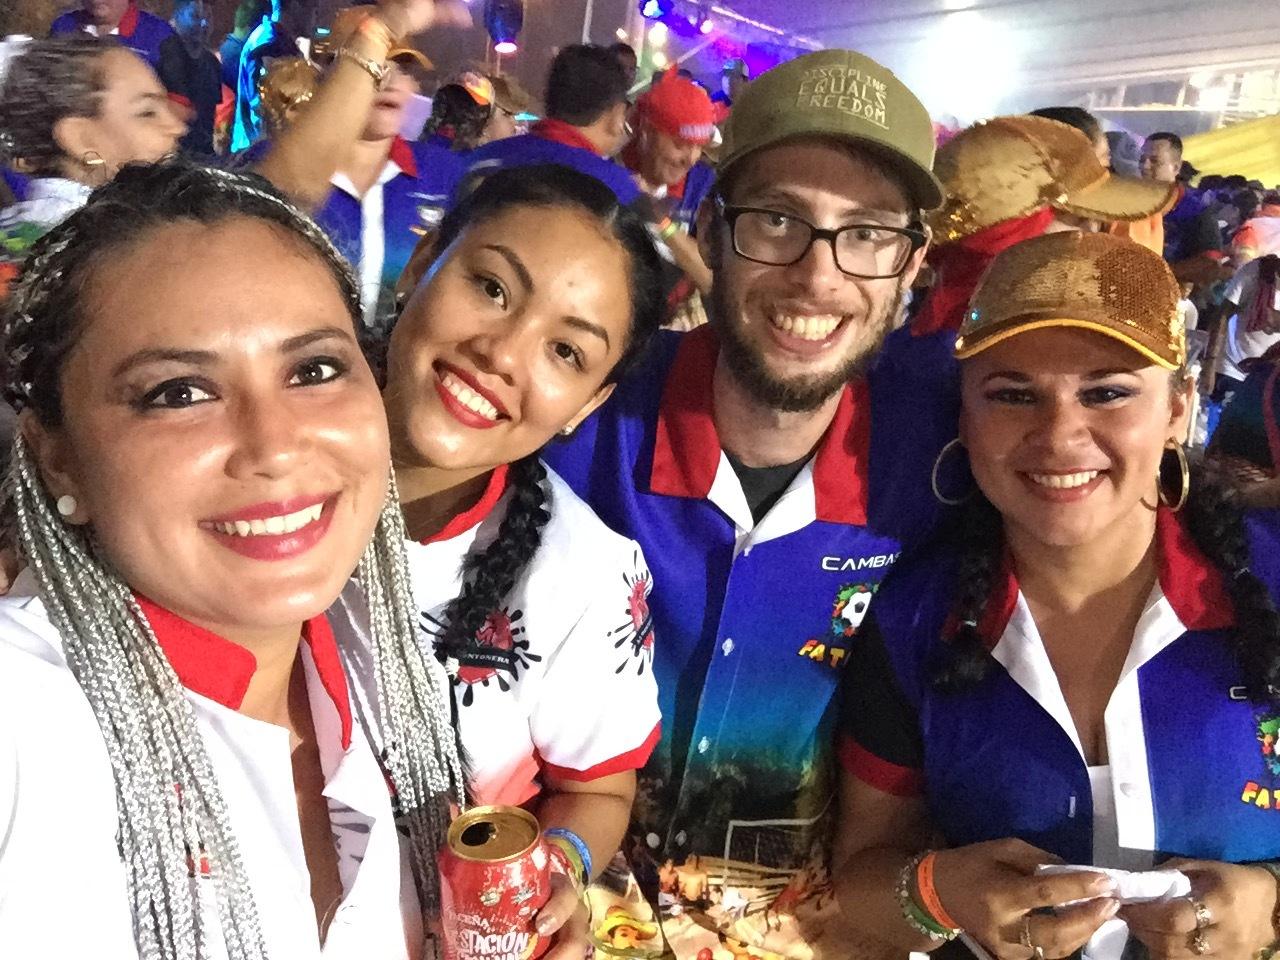 Carnaval in Santa Cruz de la Sierra!